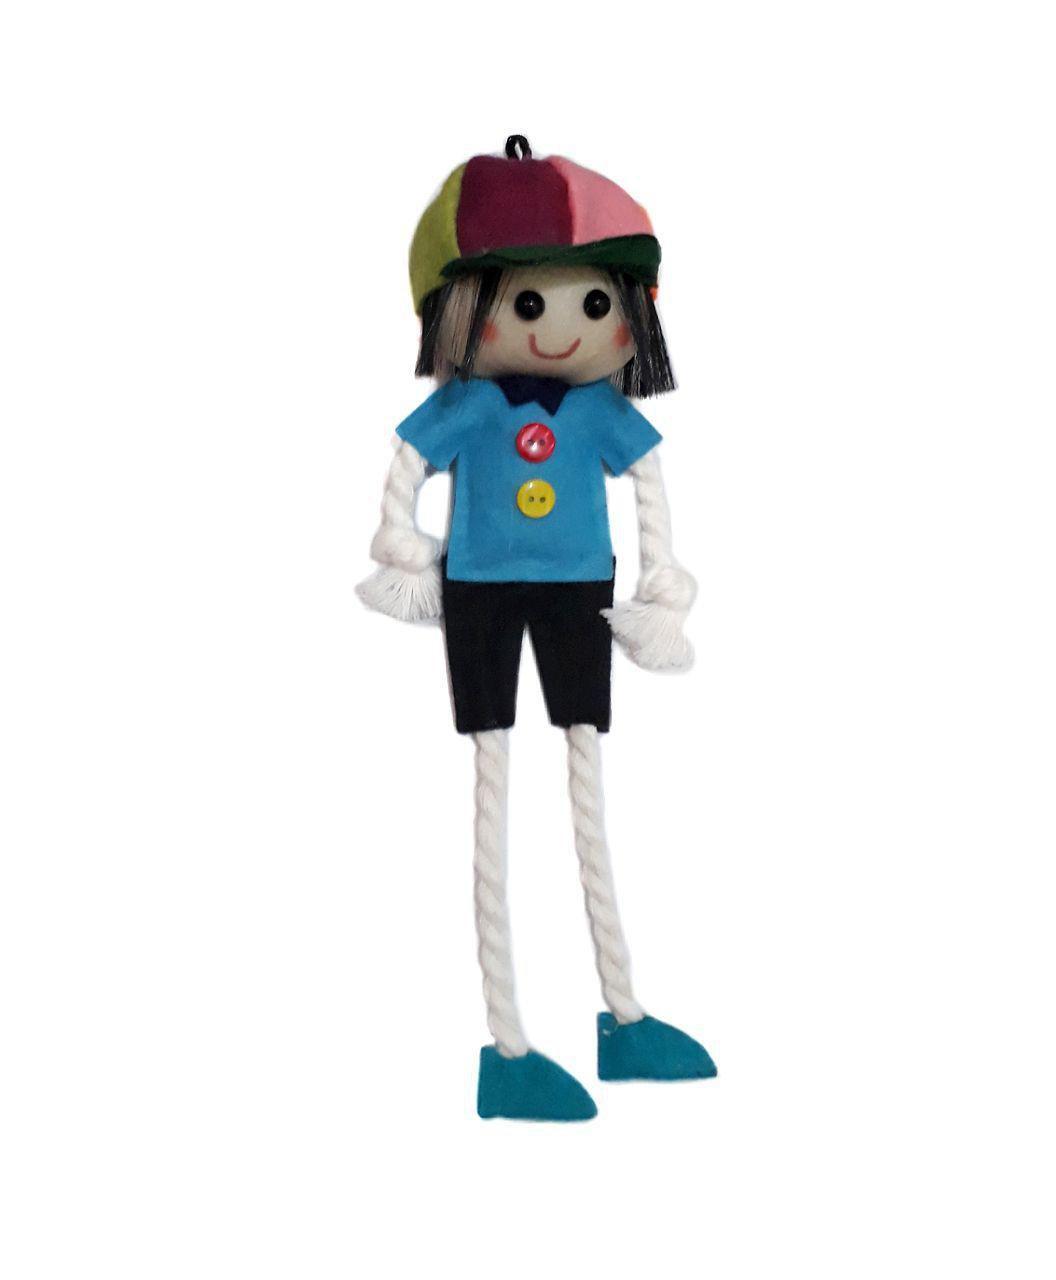 مگنت یخچال عروسک پسر نمدی آویزی